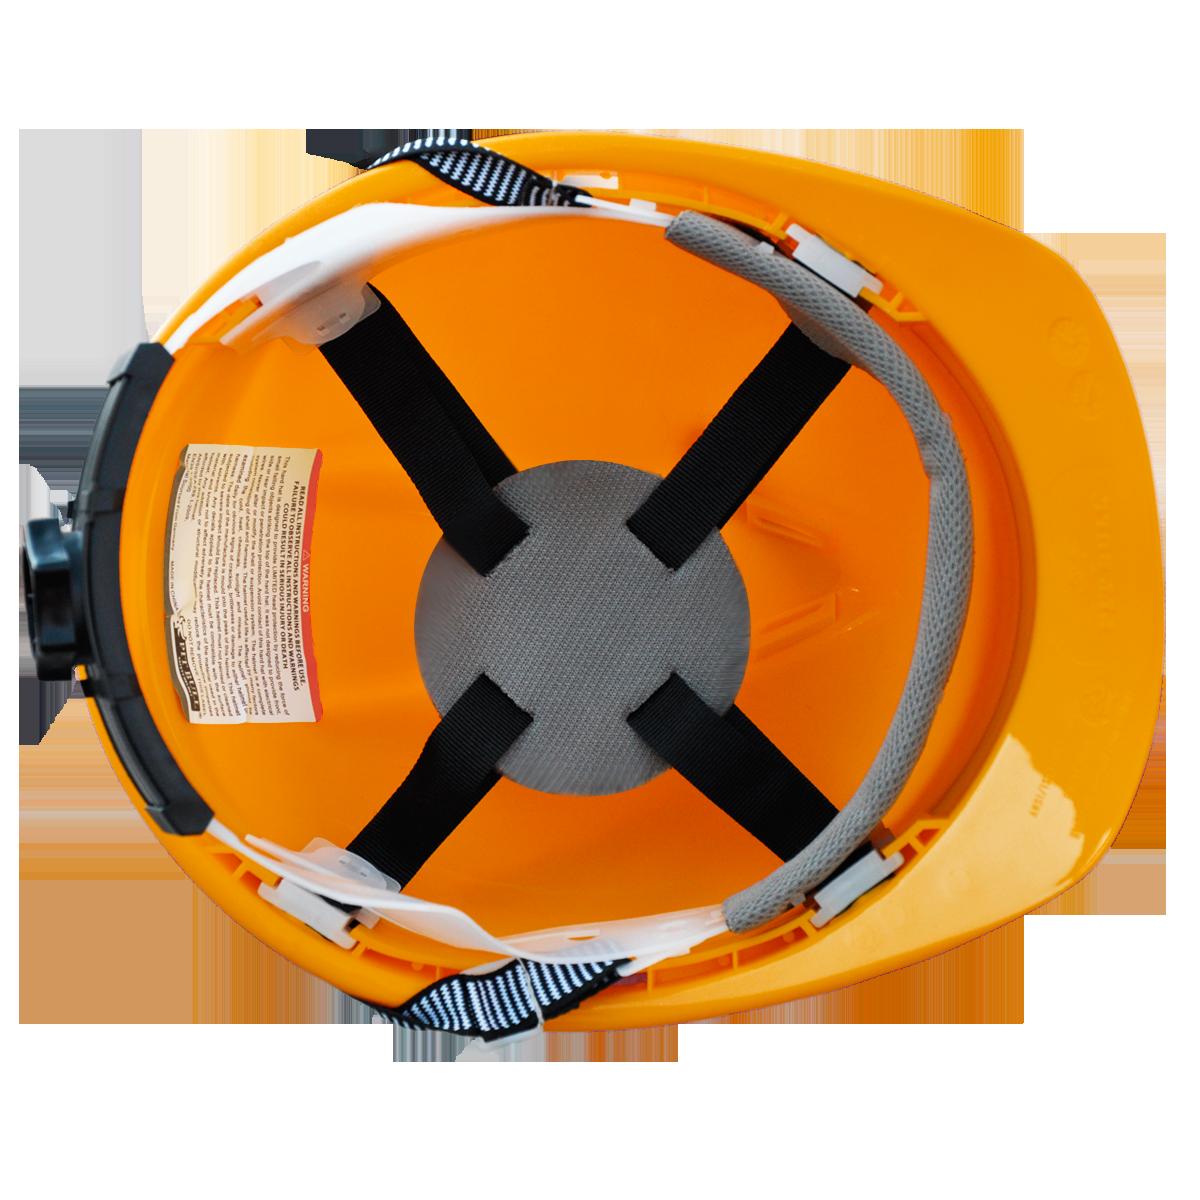 Pitbull Helmet Orange